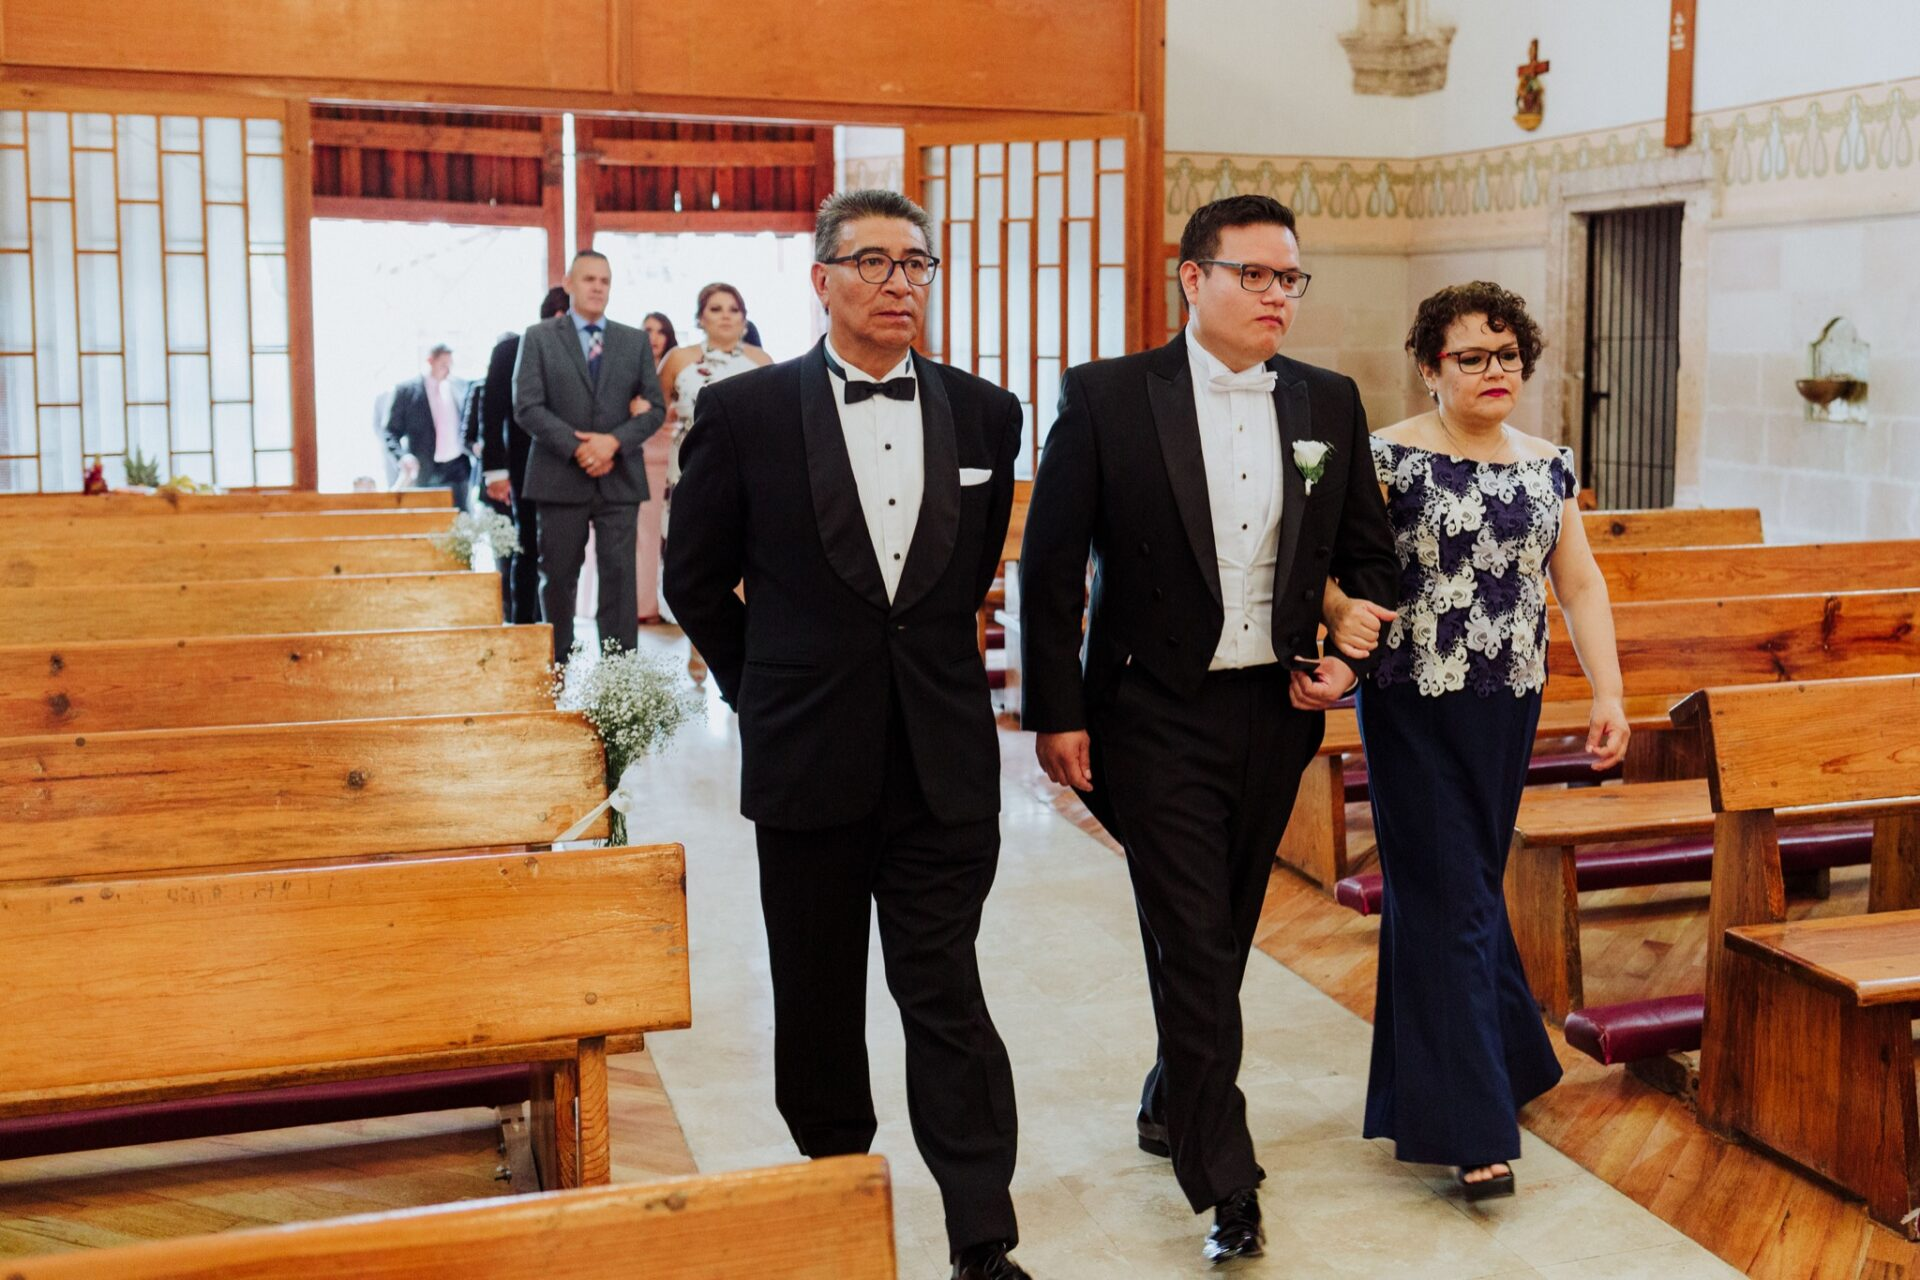 javier_noriega_fotografo_bodas_teul_zacatecas_wedding_photographer6a